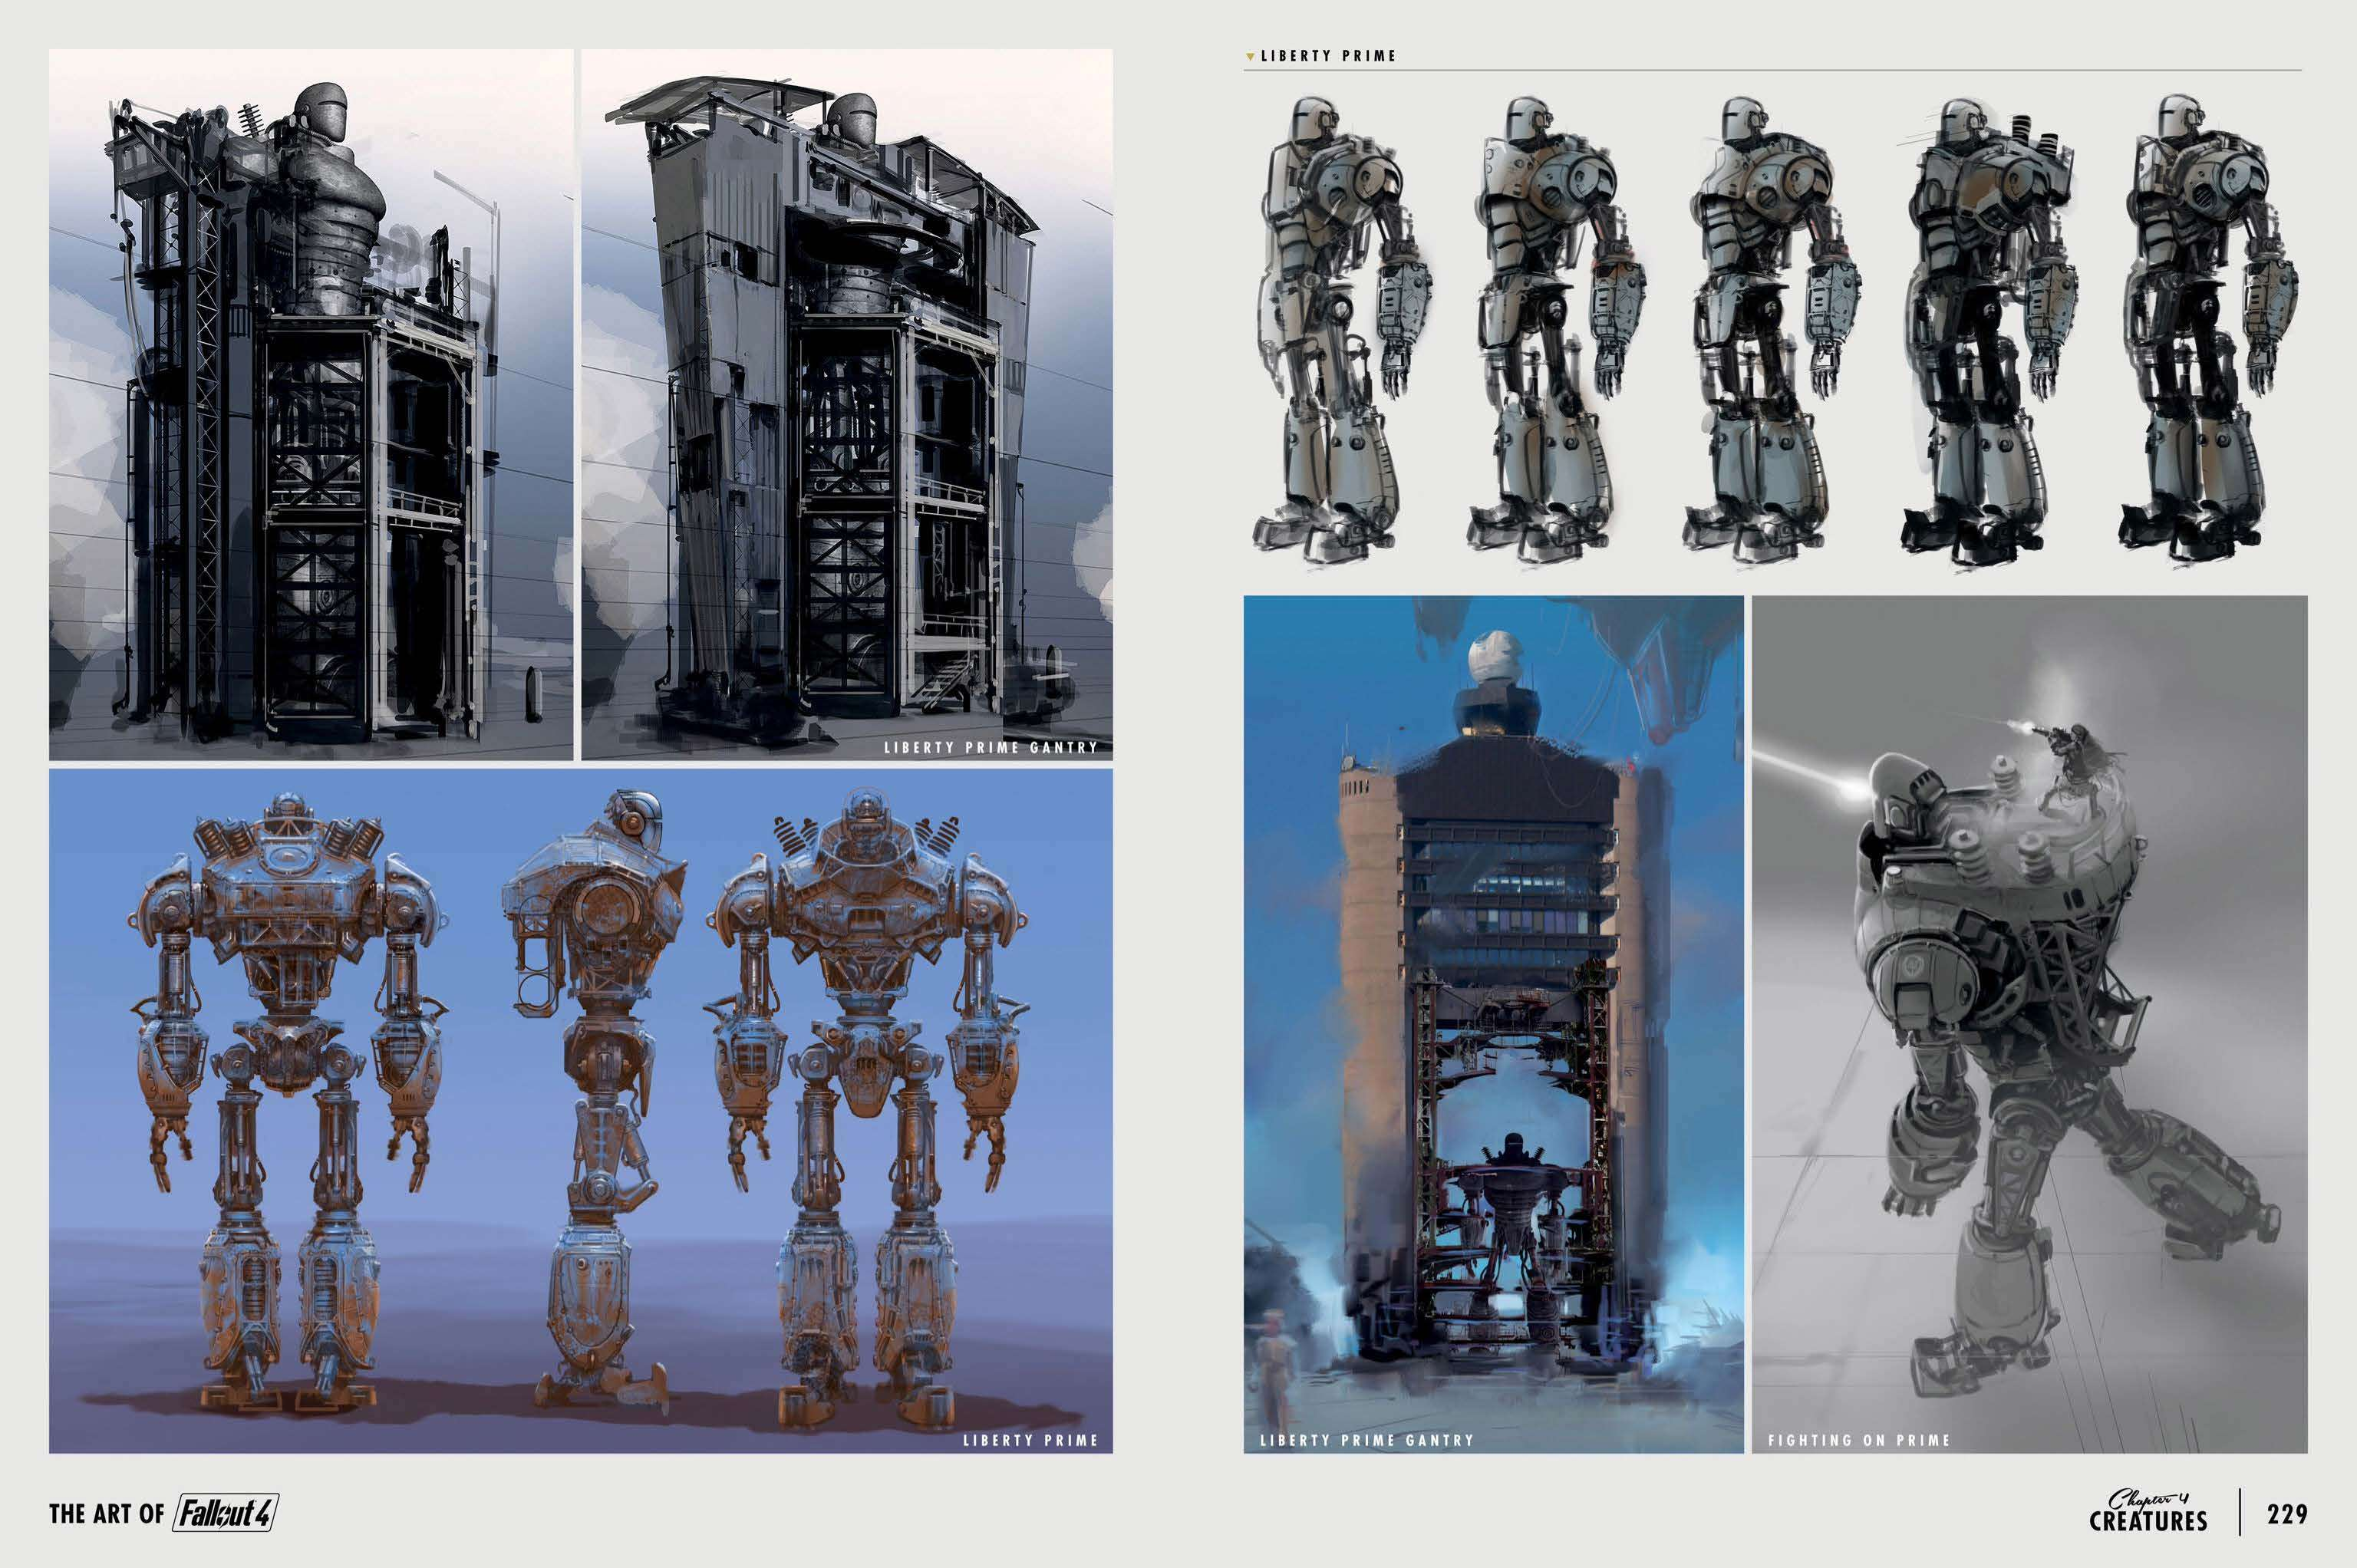 The Art of Fallout 4 - # 115 - Fallout 4 арт